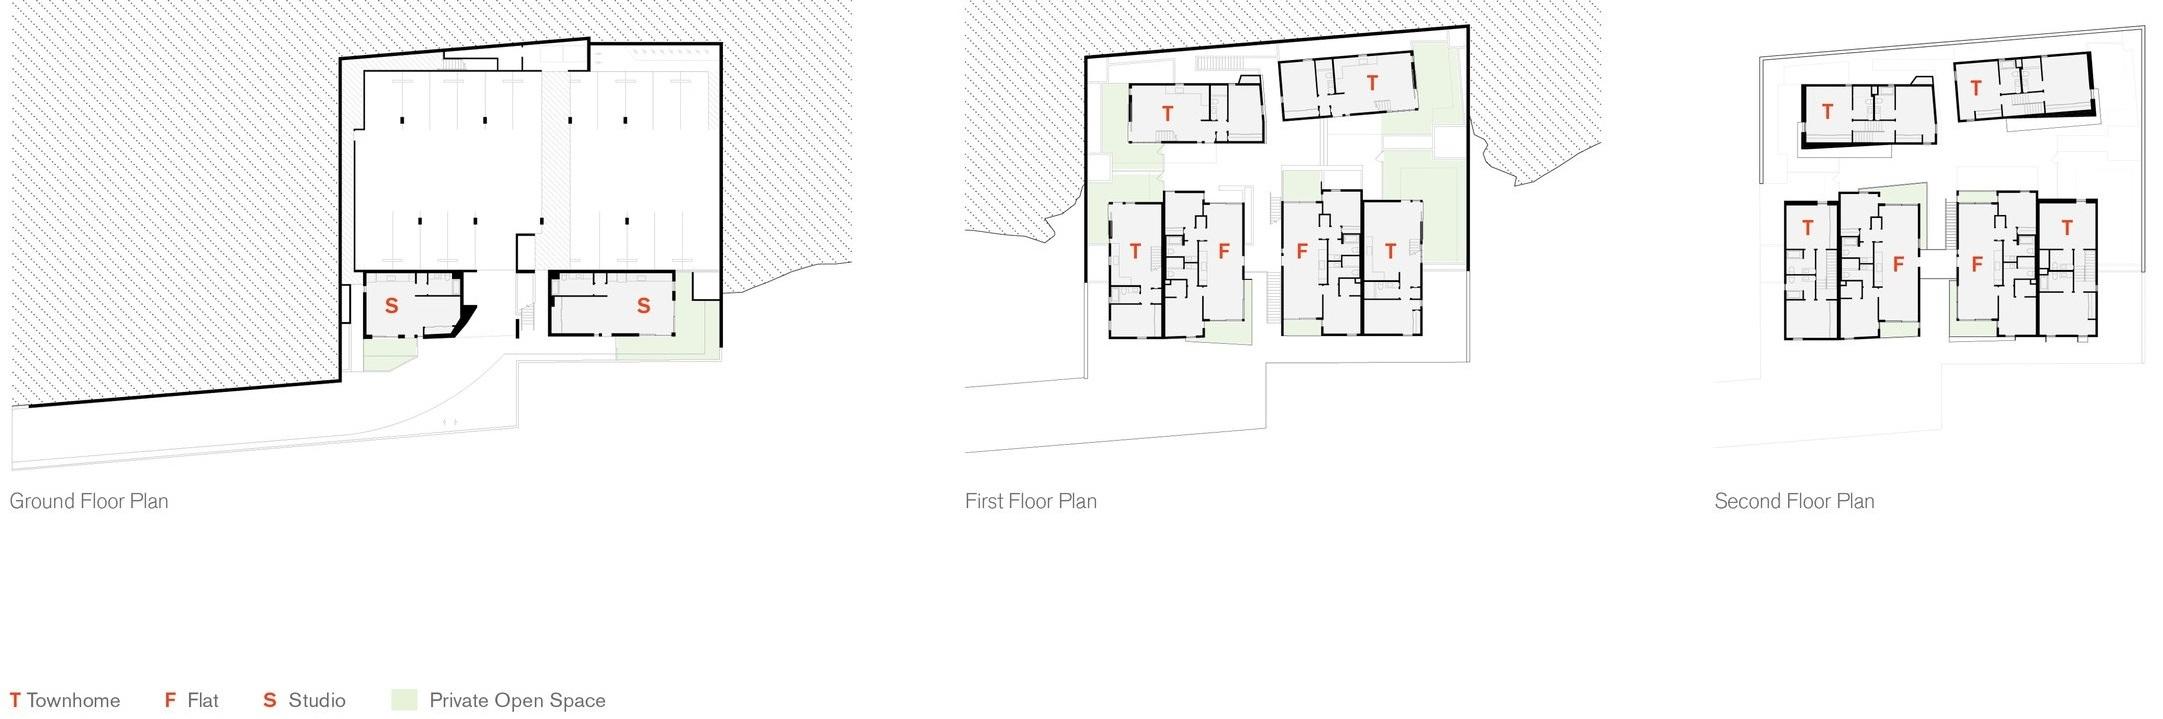 Floor%252BPlans%252B-%252Bhorizontal%252Borientation.jpg